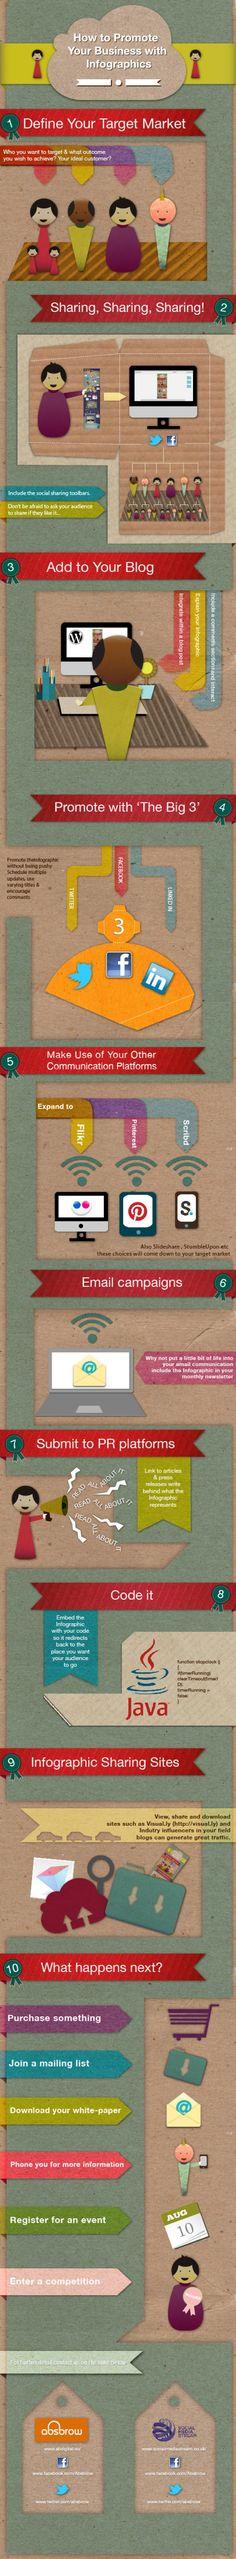 Cómo promocionar tu negocio con #infografías. Daily Infographic: How to Promote Your Business with Infographics